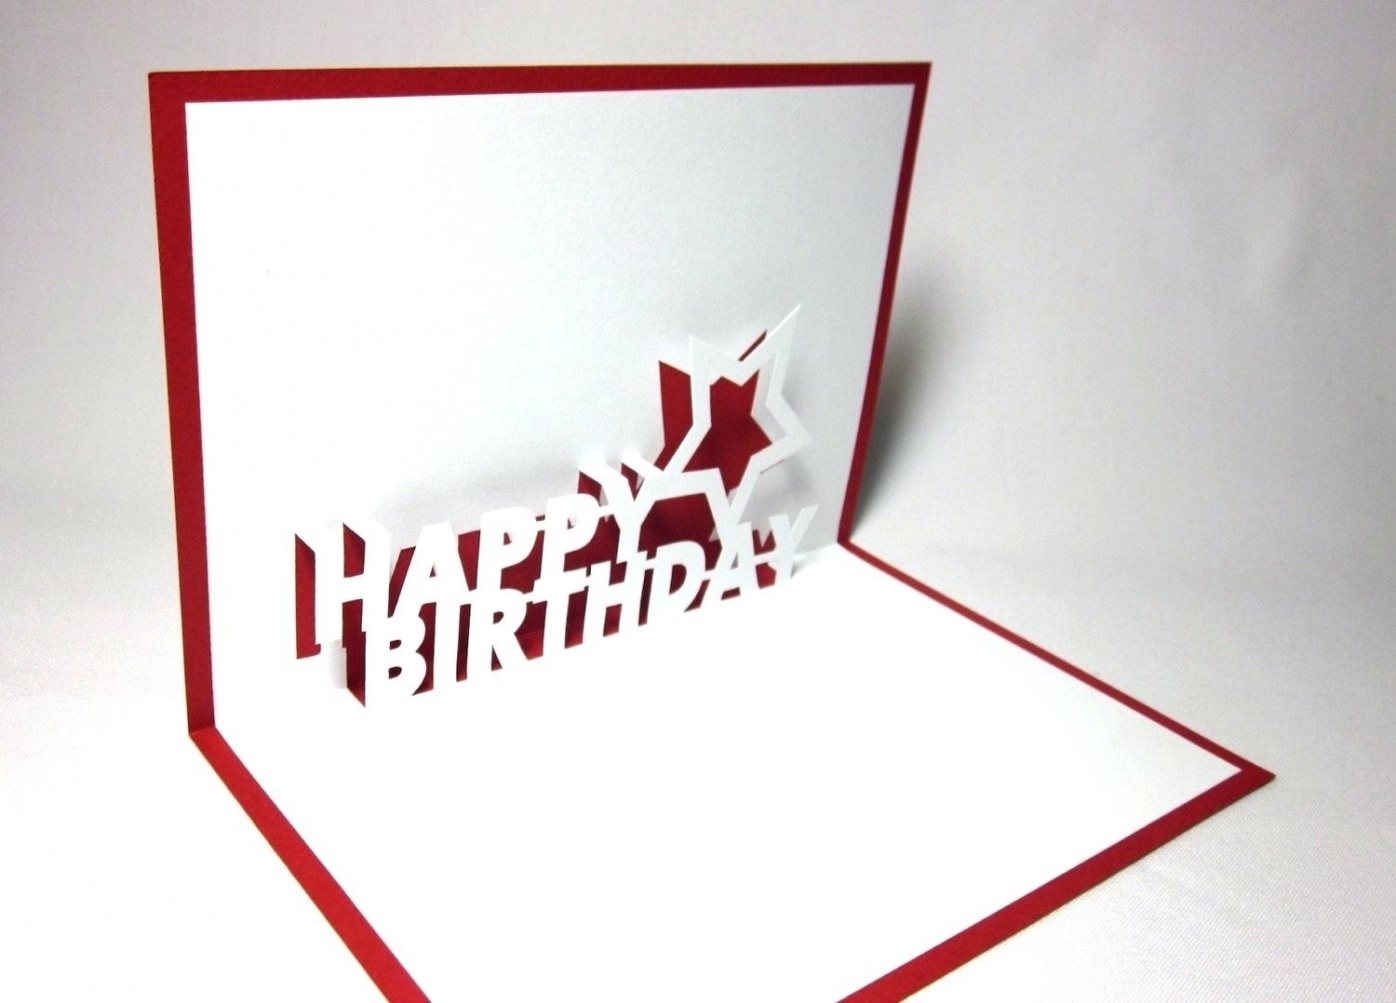 009 Pop Up Birthday Card Template Ideas Inspirational Free Printable - Free Printable Birthday Pop Up Card Templates